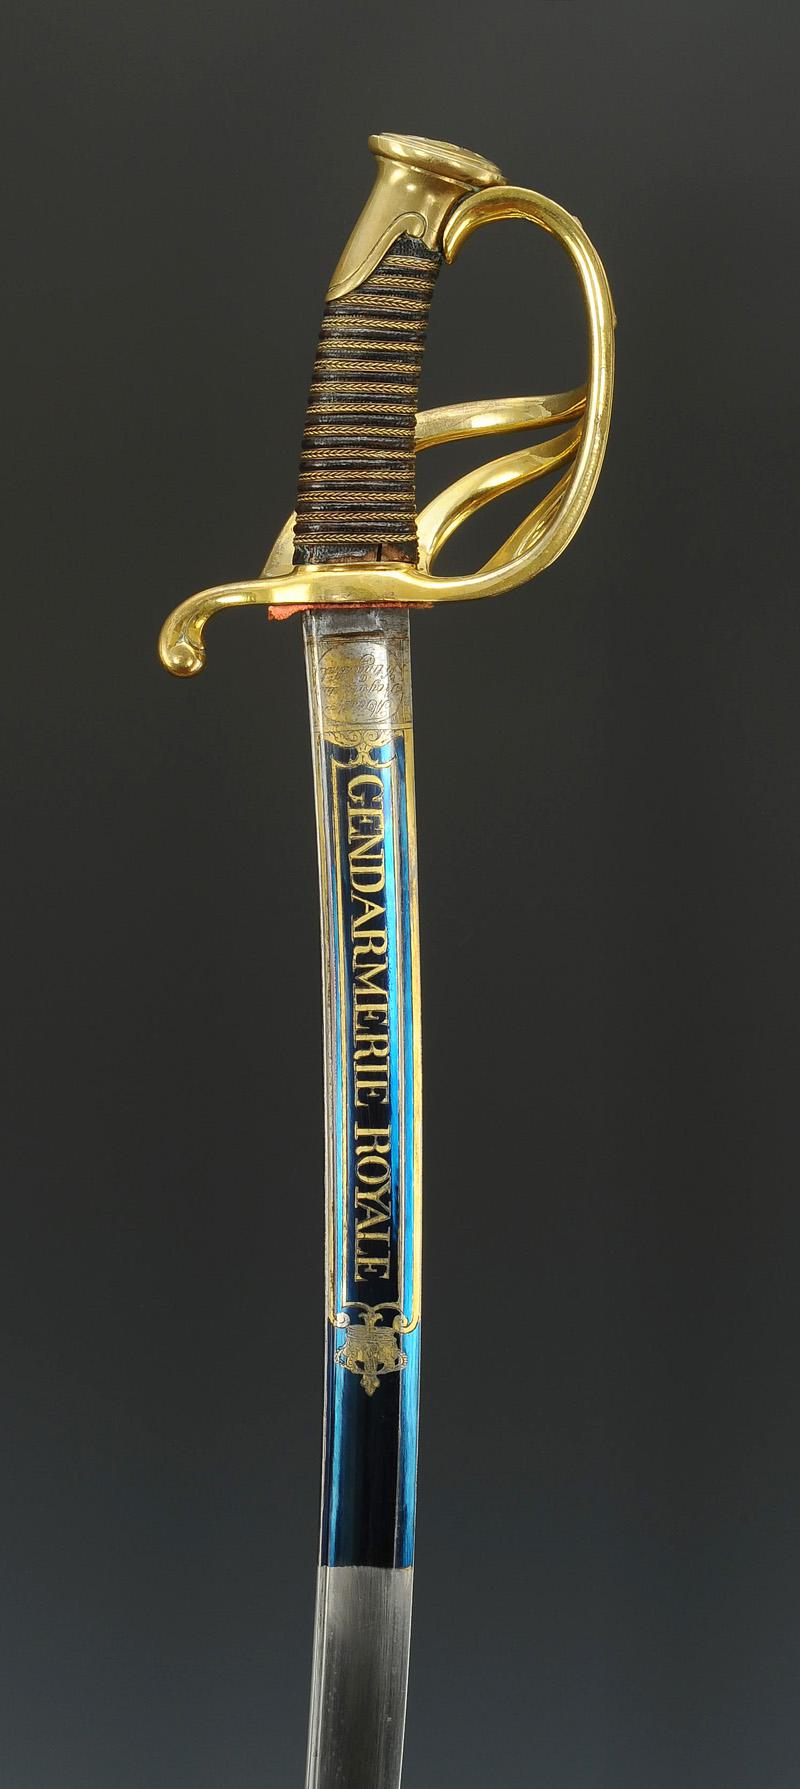 sabre d u0026 39 officier subalterne de la gendarmerie royale